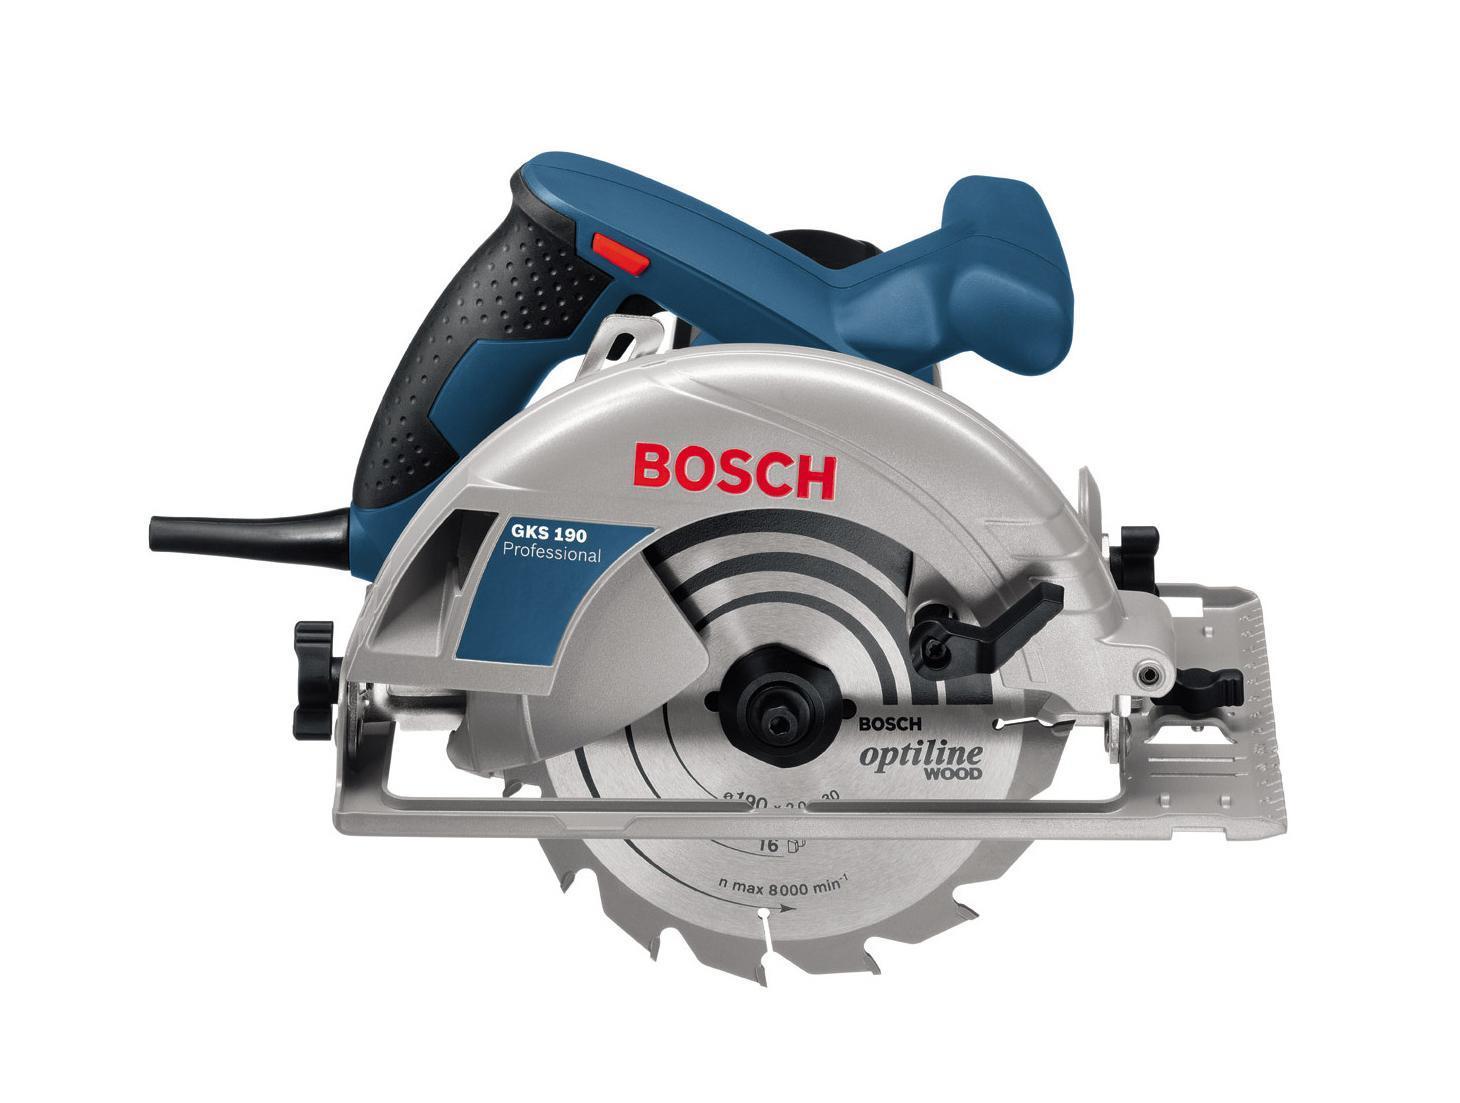 Bosch GKS 190 0601623000 – купить пилу, сравнение цен ... - photo#24